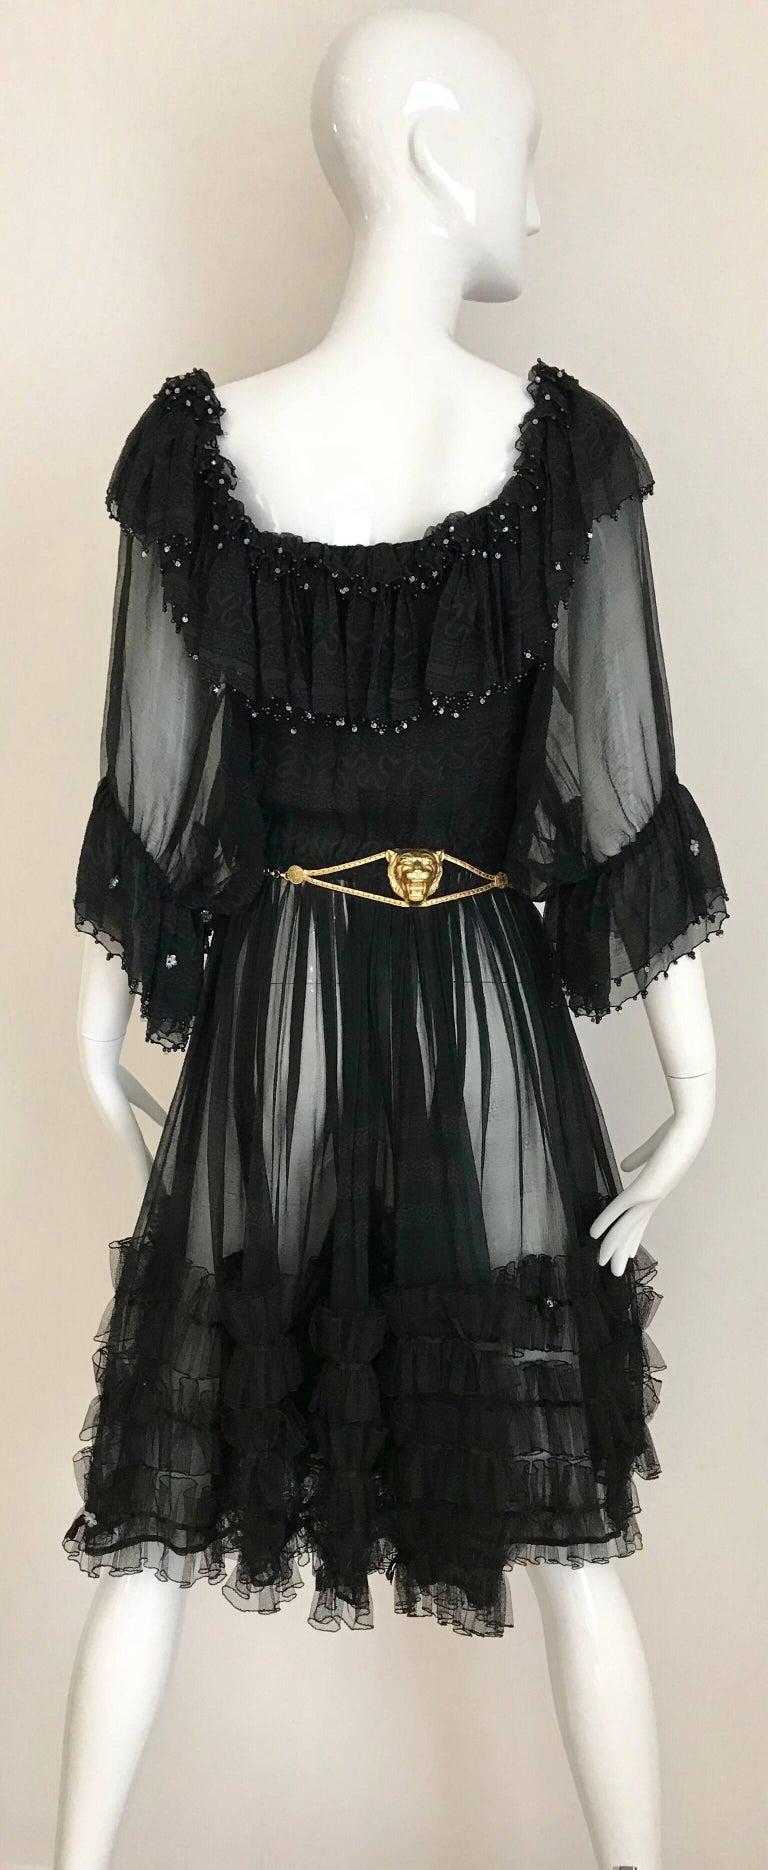 Zandra Rhodes Vintage Black Silk Cocktail Dress For Sale 4